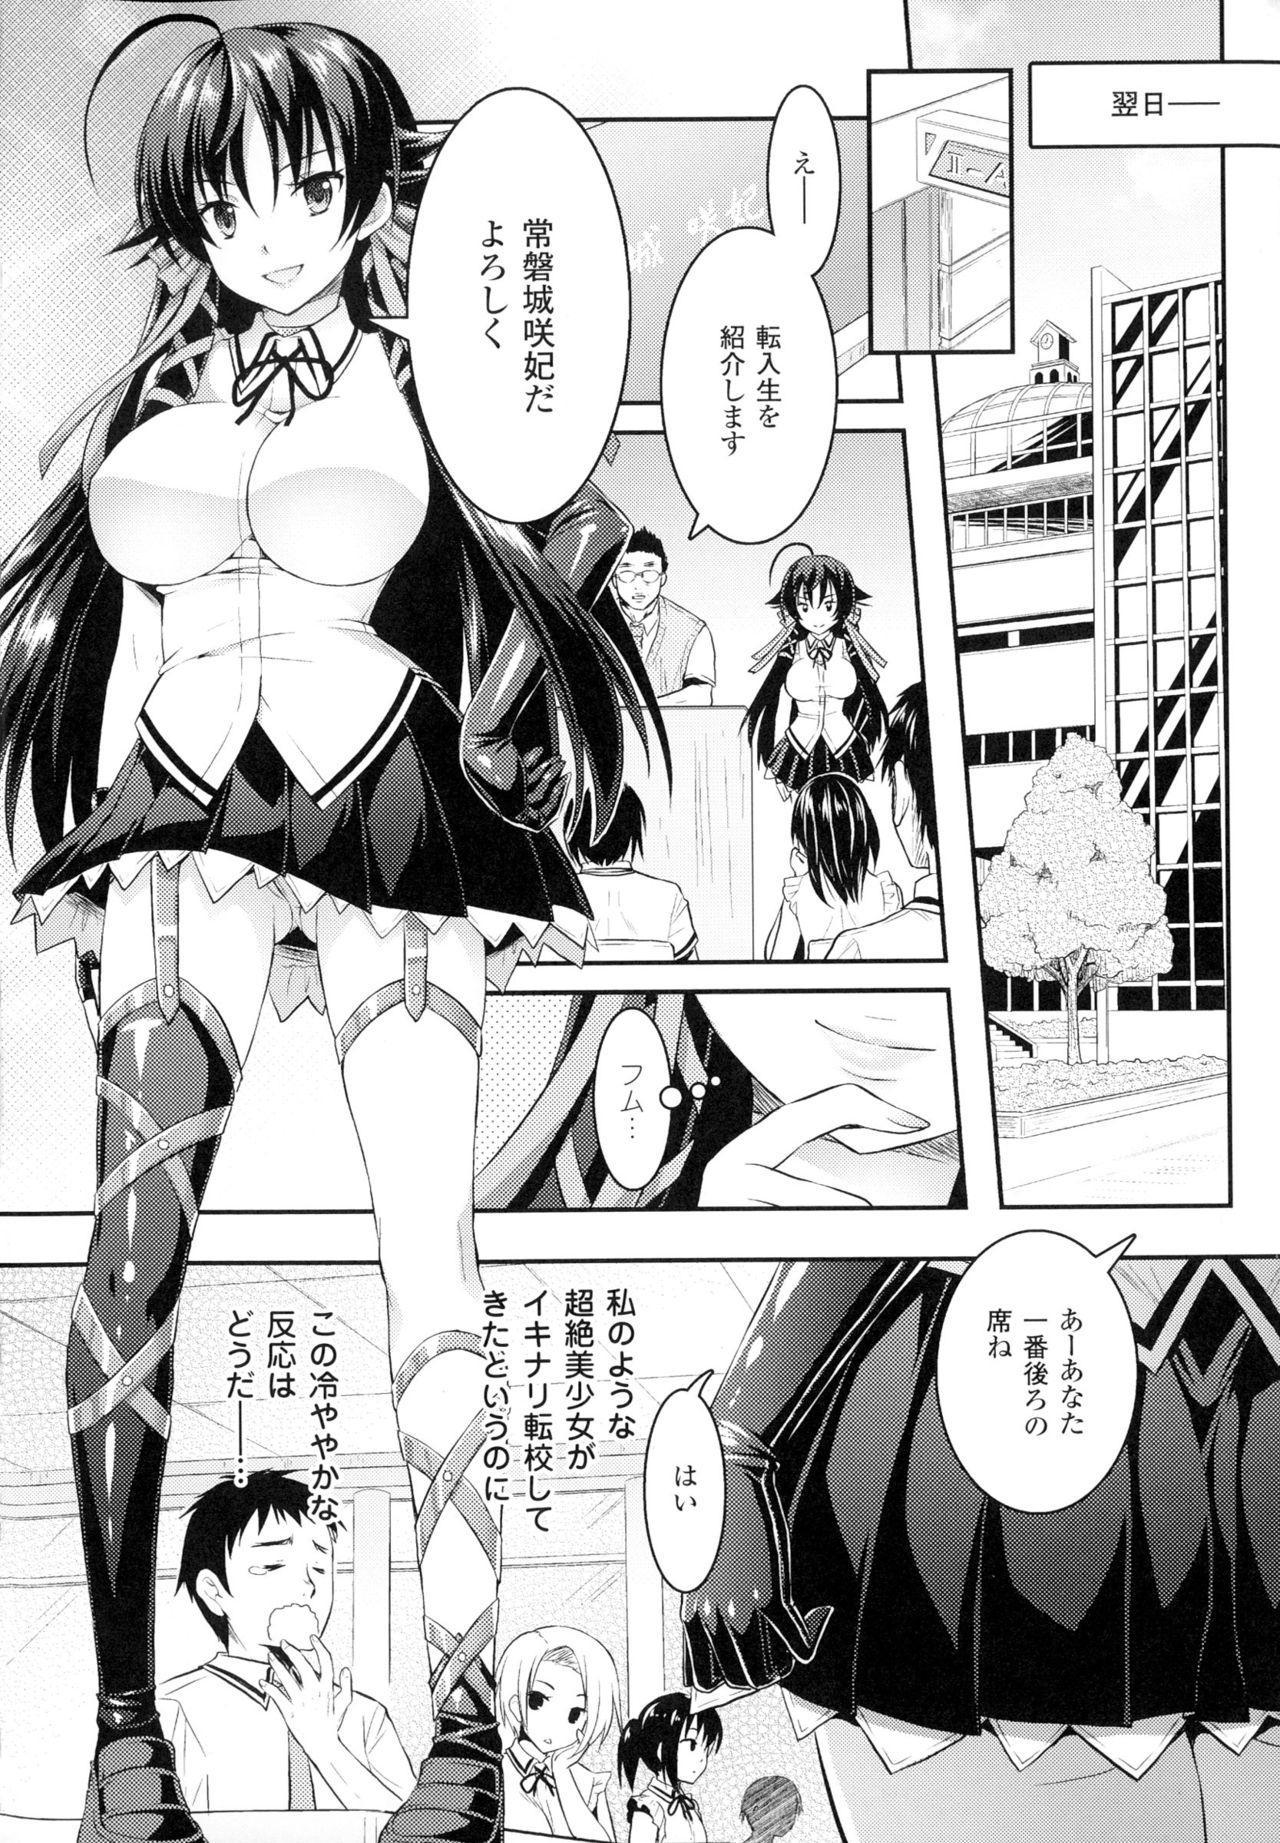 Seigi no Heroine Kangoku File DX Vol. 1 18